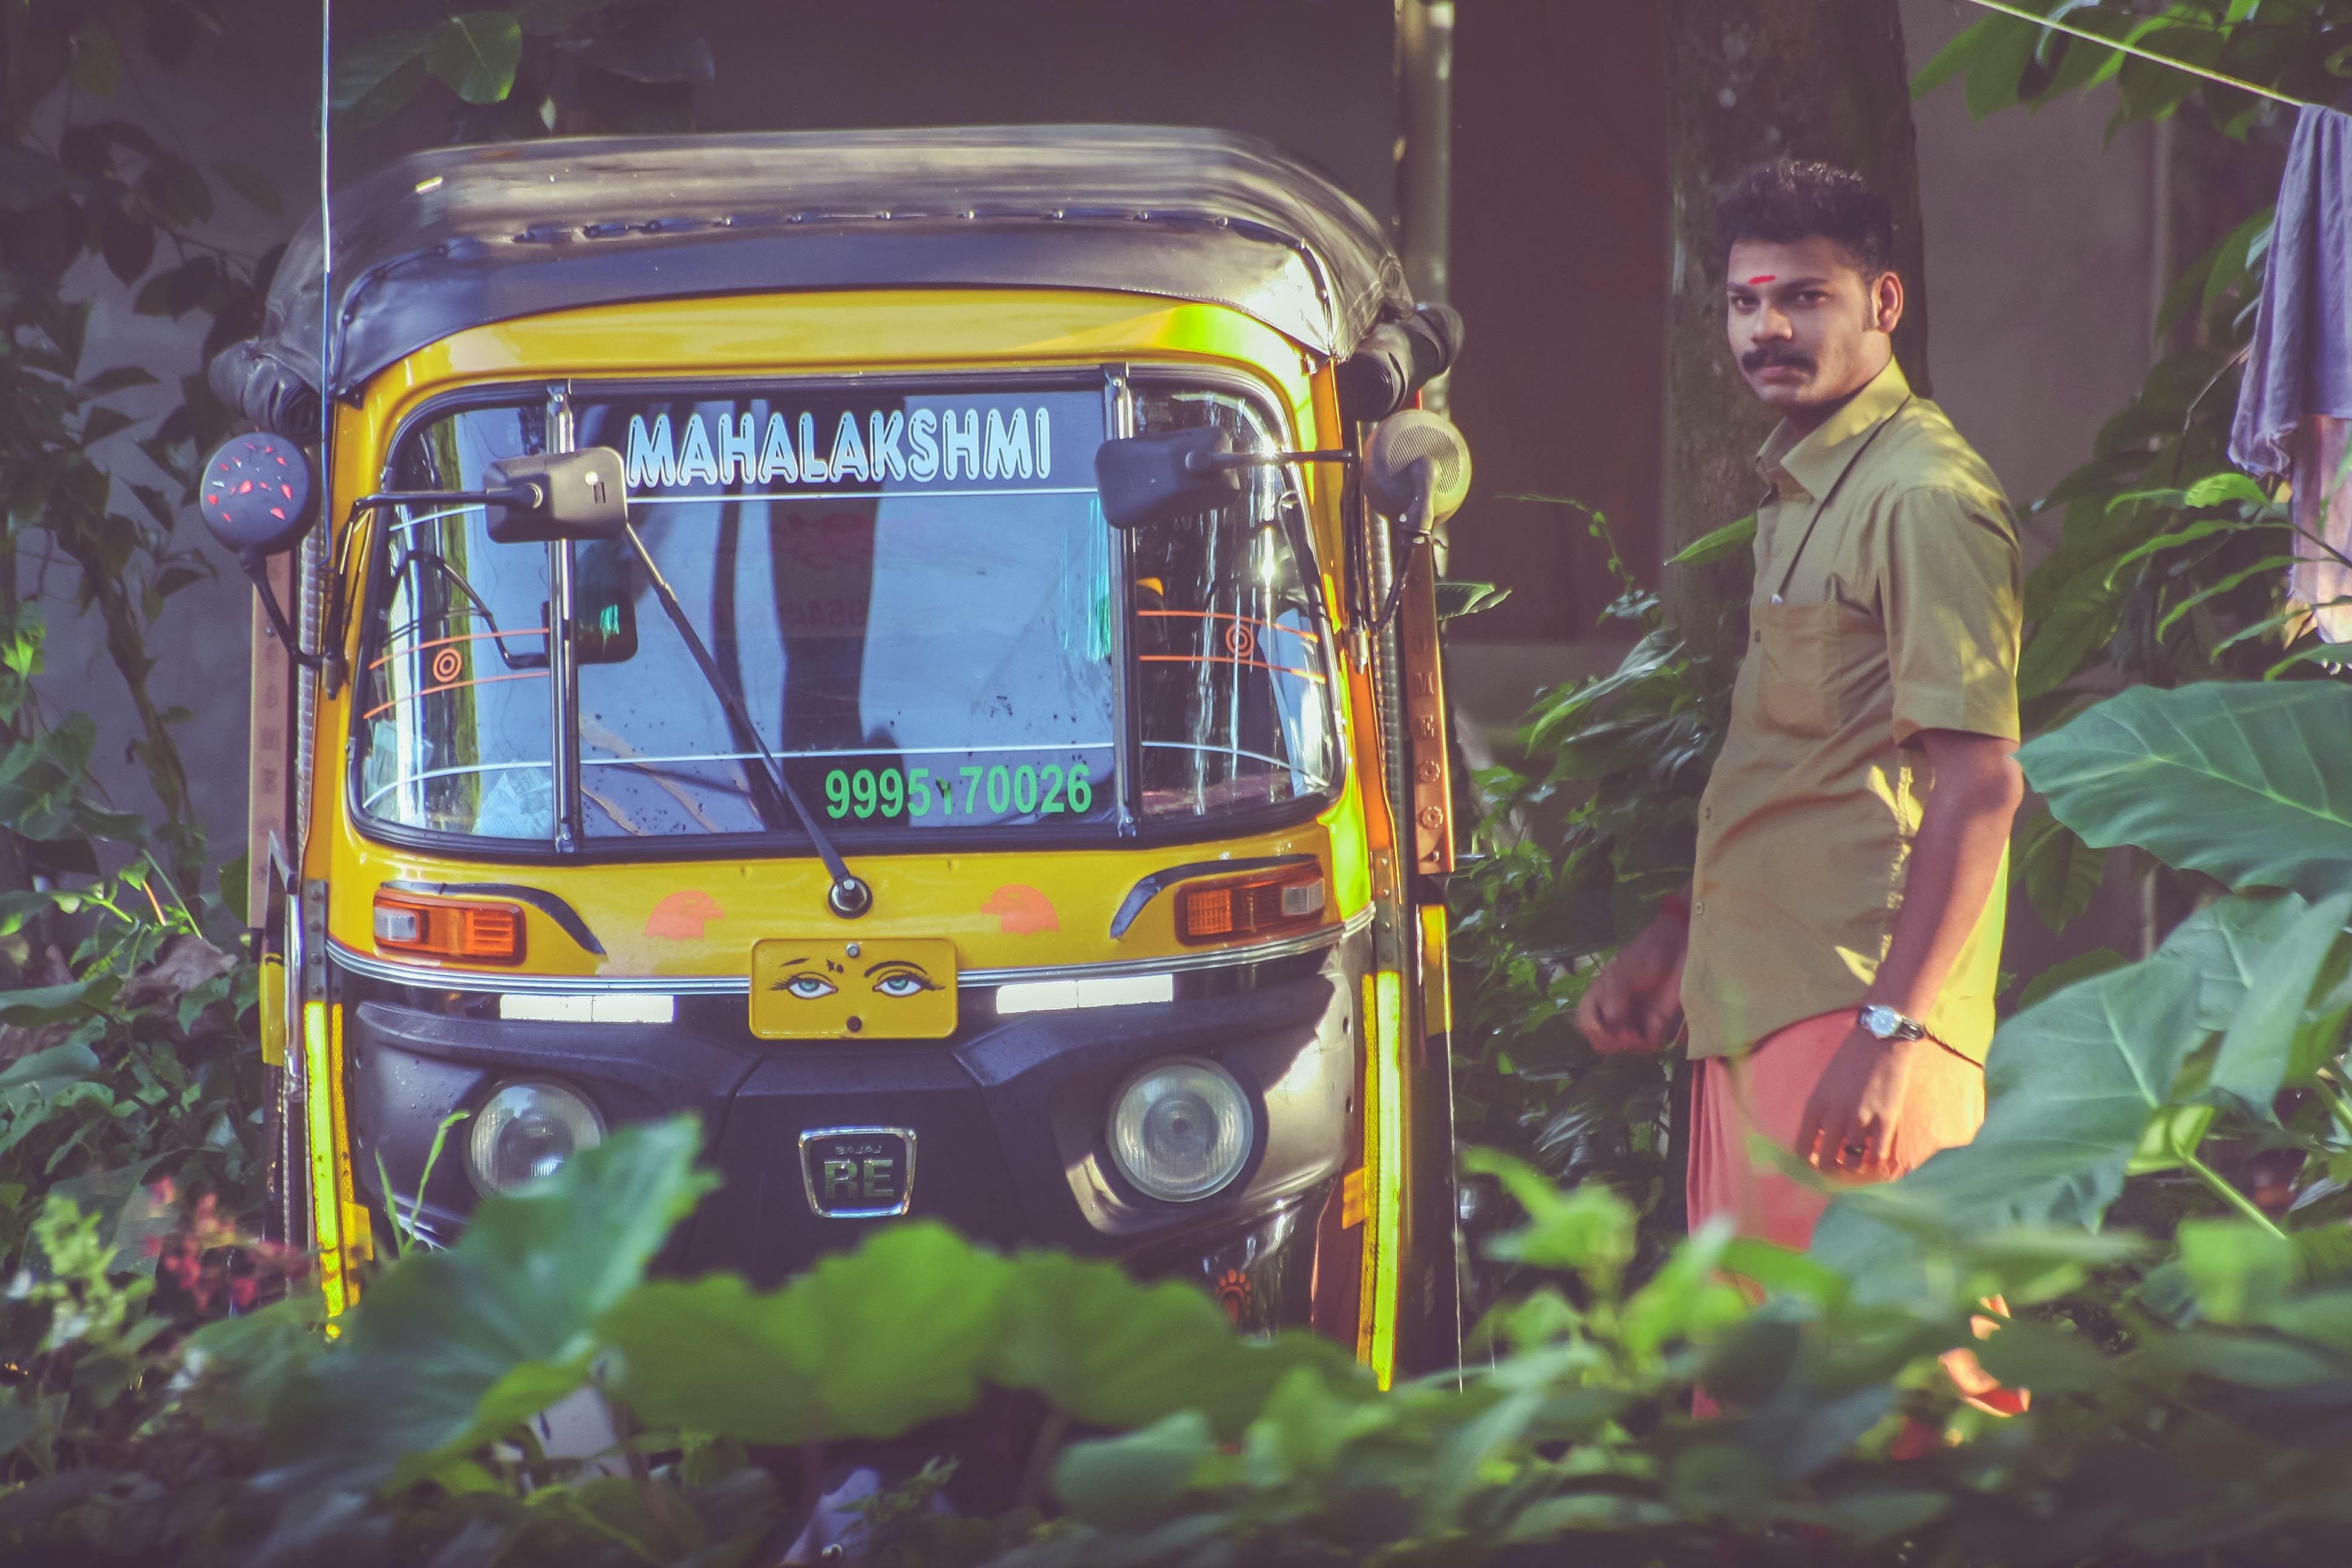 man standing beside of auto-rickshaw